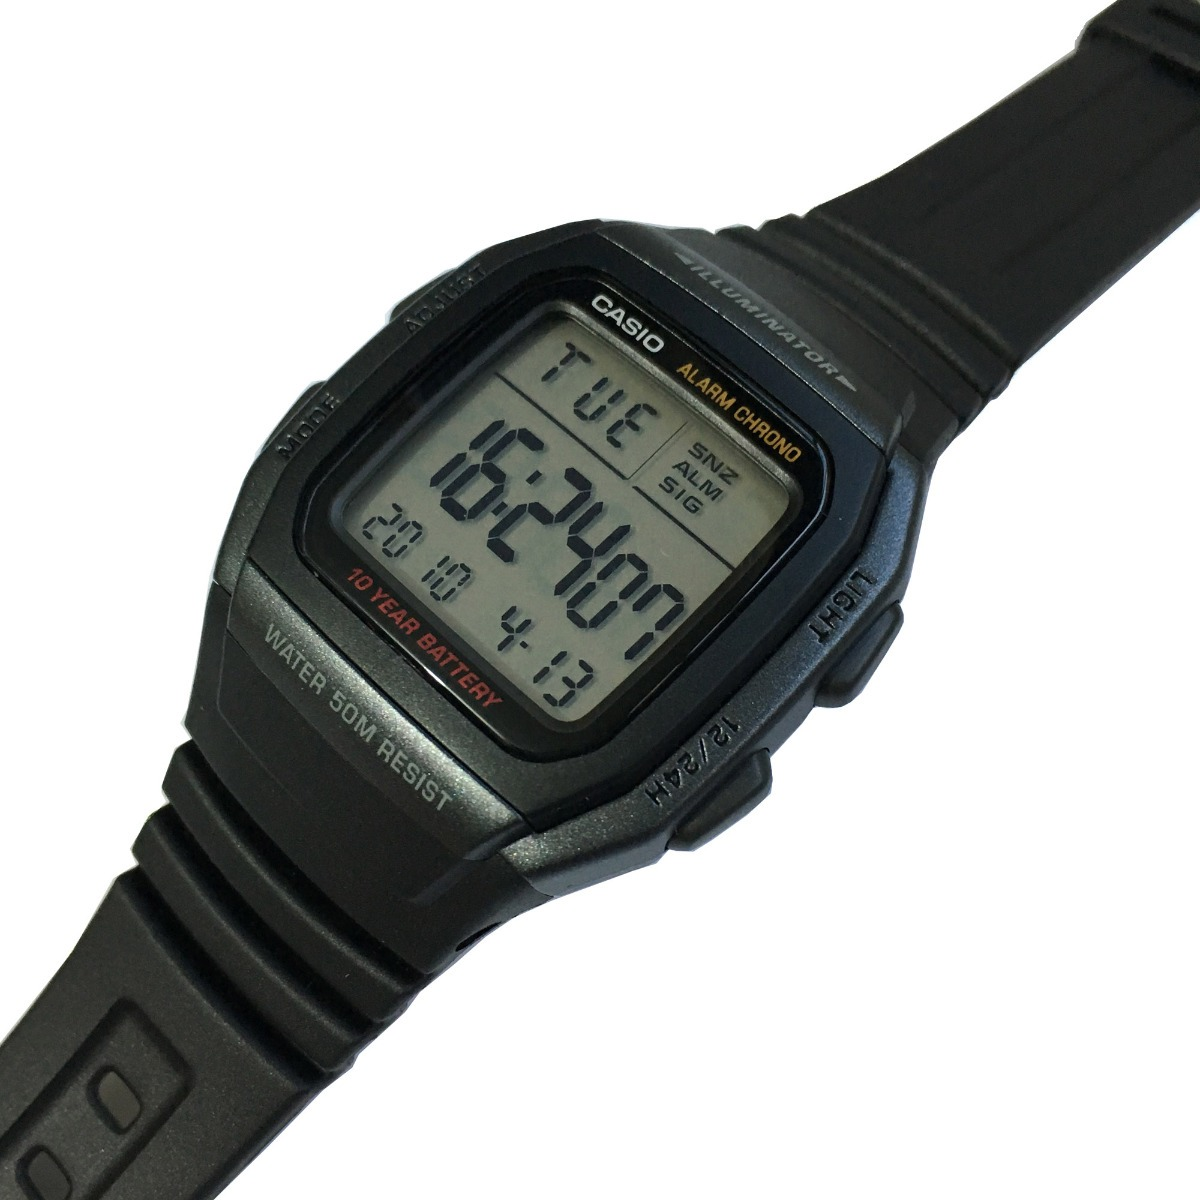 relogio casio digital w-96h 1bv alarme crono wr.50m original. Carregando  zoom. 78f52b3dfc